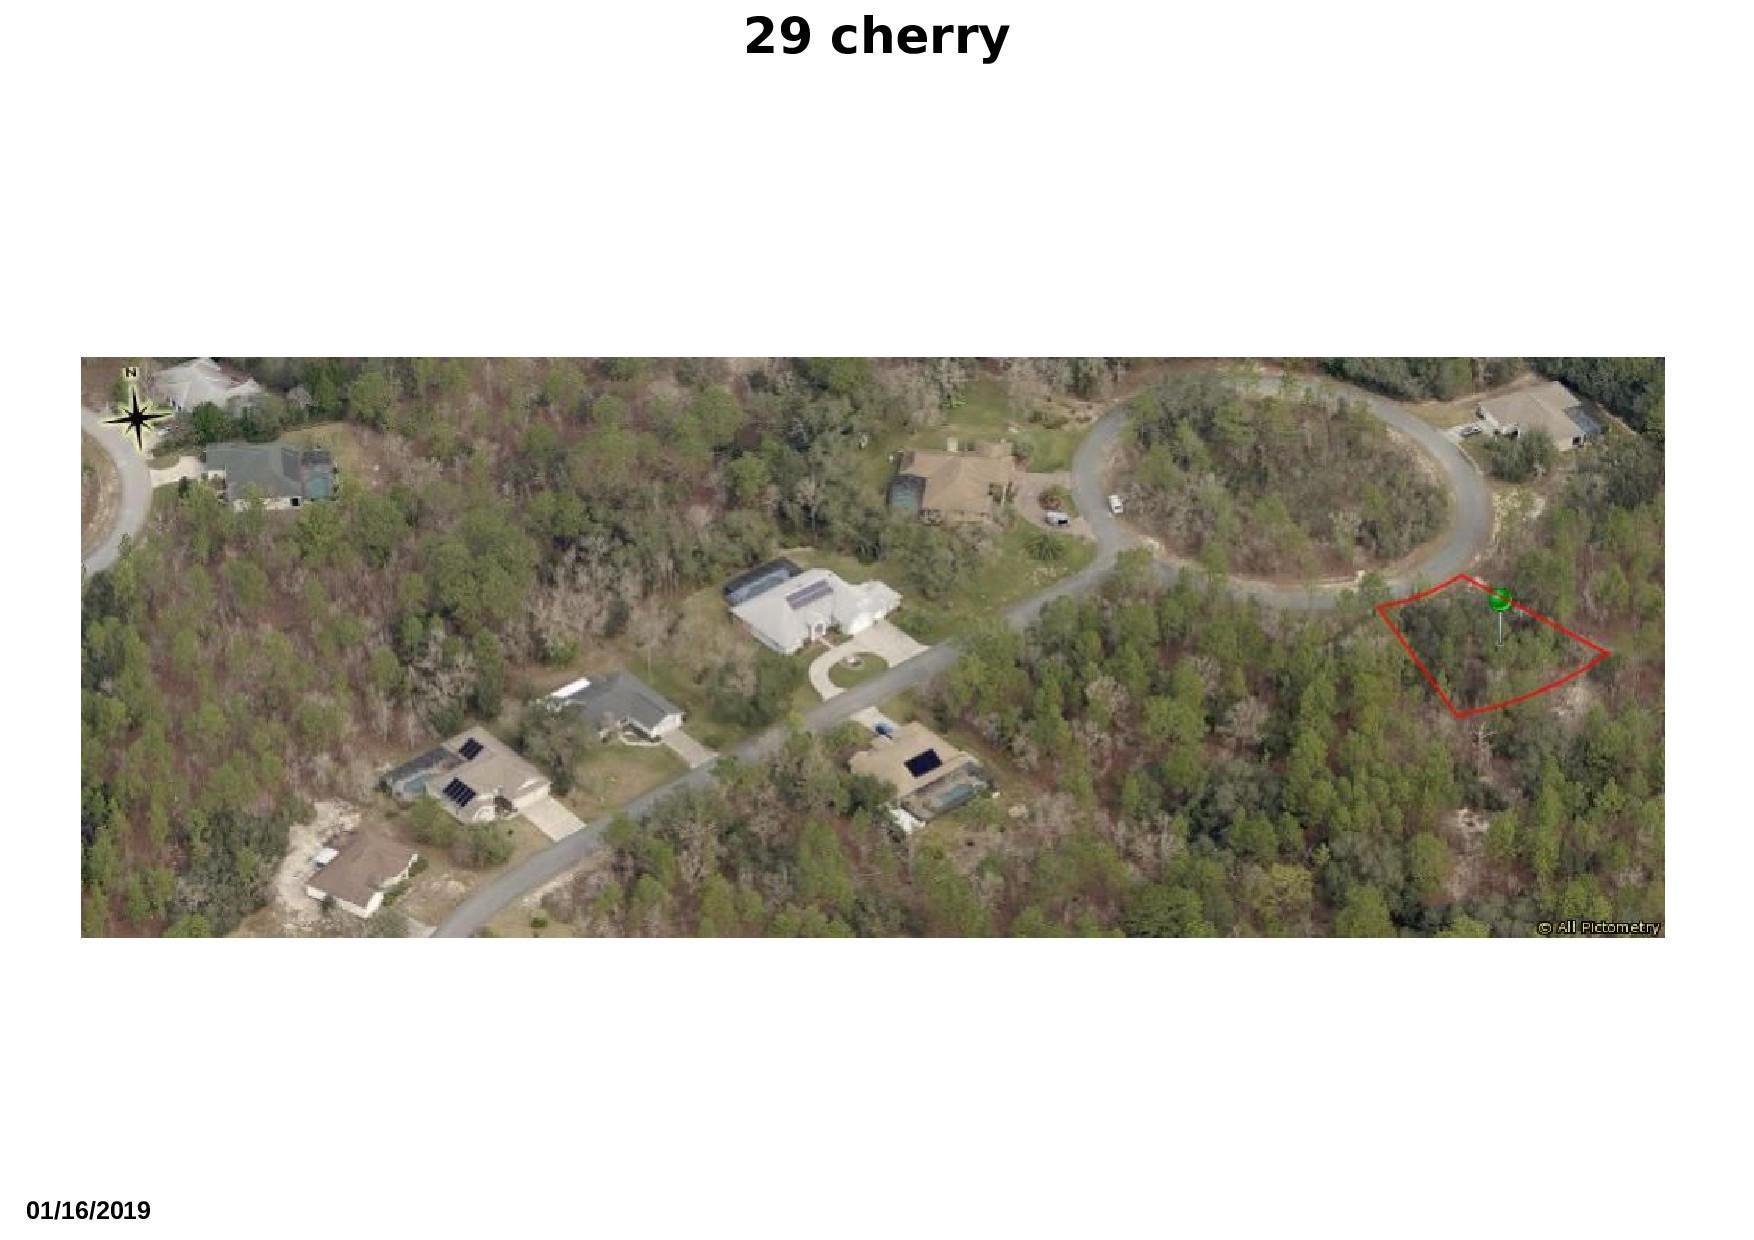 29 cherrypalm 3 redone